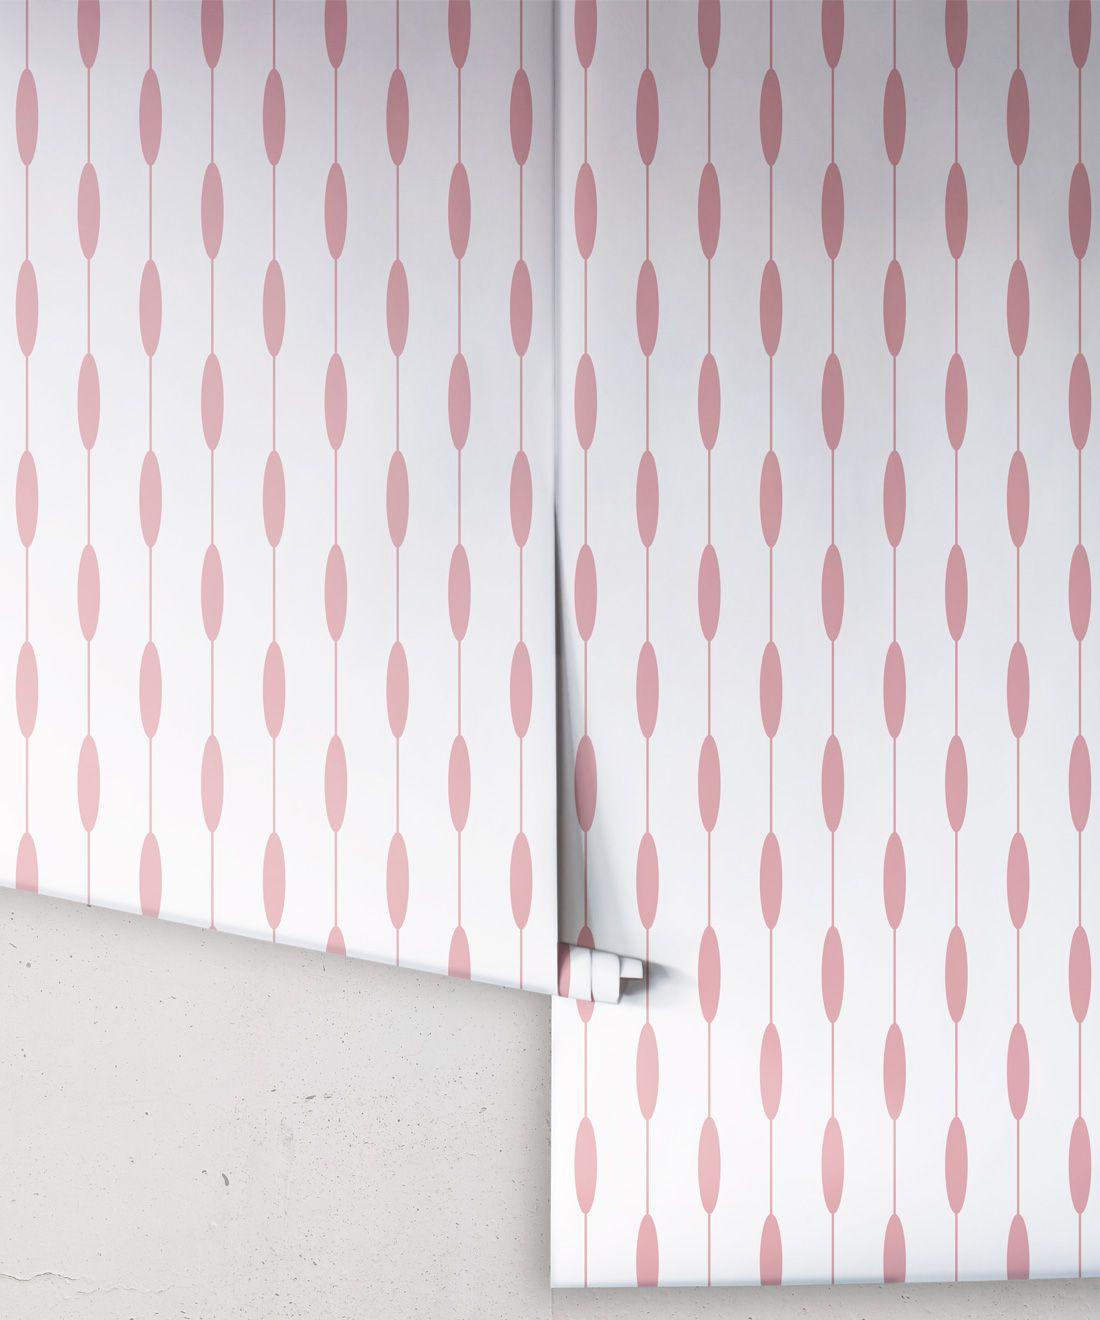 Bowline Wallpaper • Geometric Wallpaper • Striped Wallpaper • Pink Wallpaper •Rolls